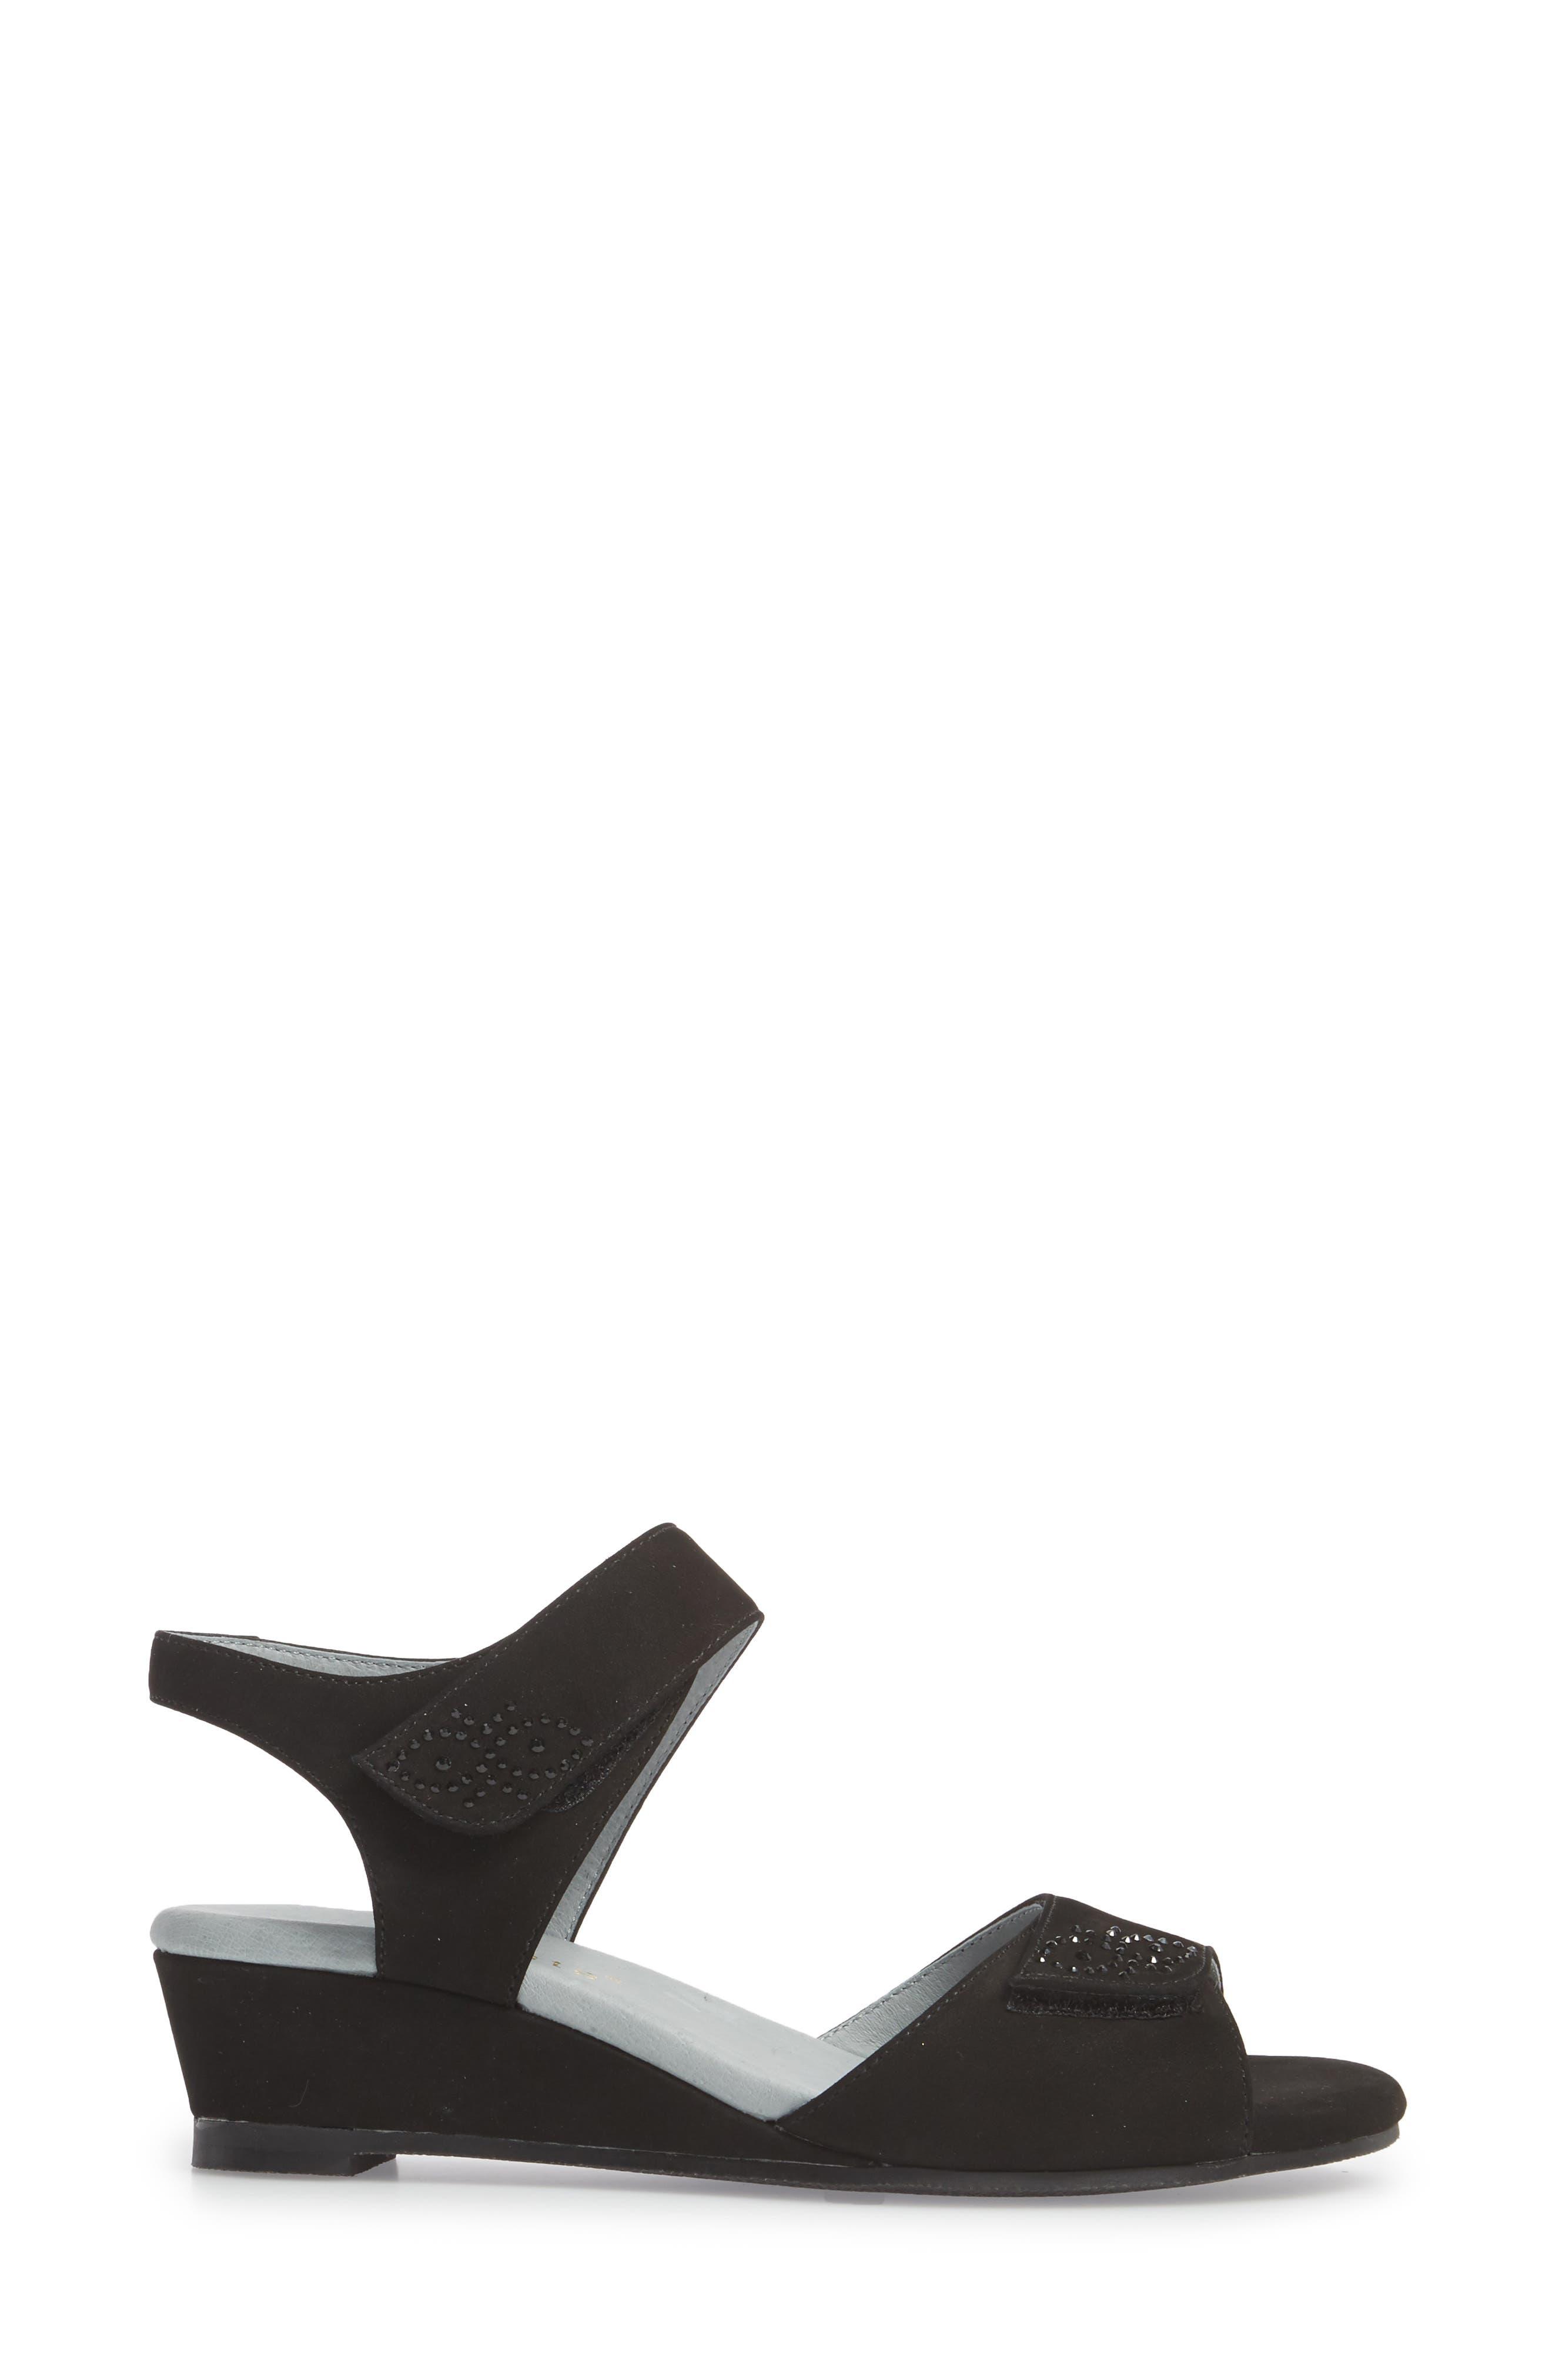 DAVID TATE, Queen Embellished Wedge Sandal, Alternate thumbnail 3, color, BLACK NUBUCK